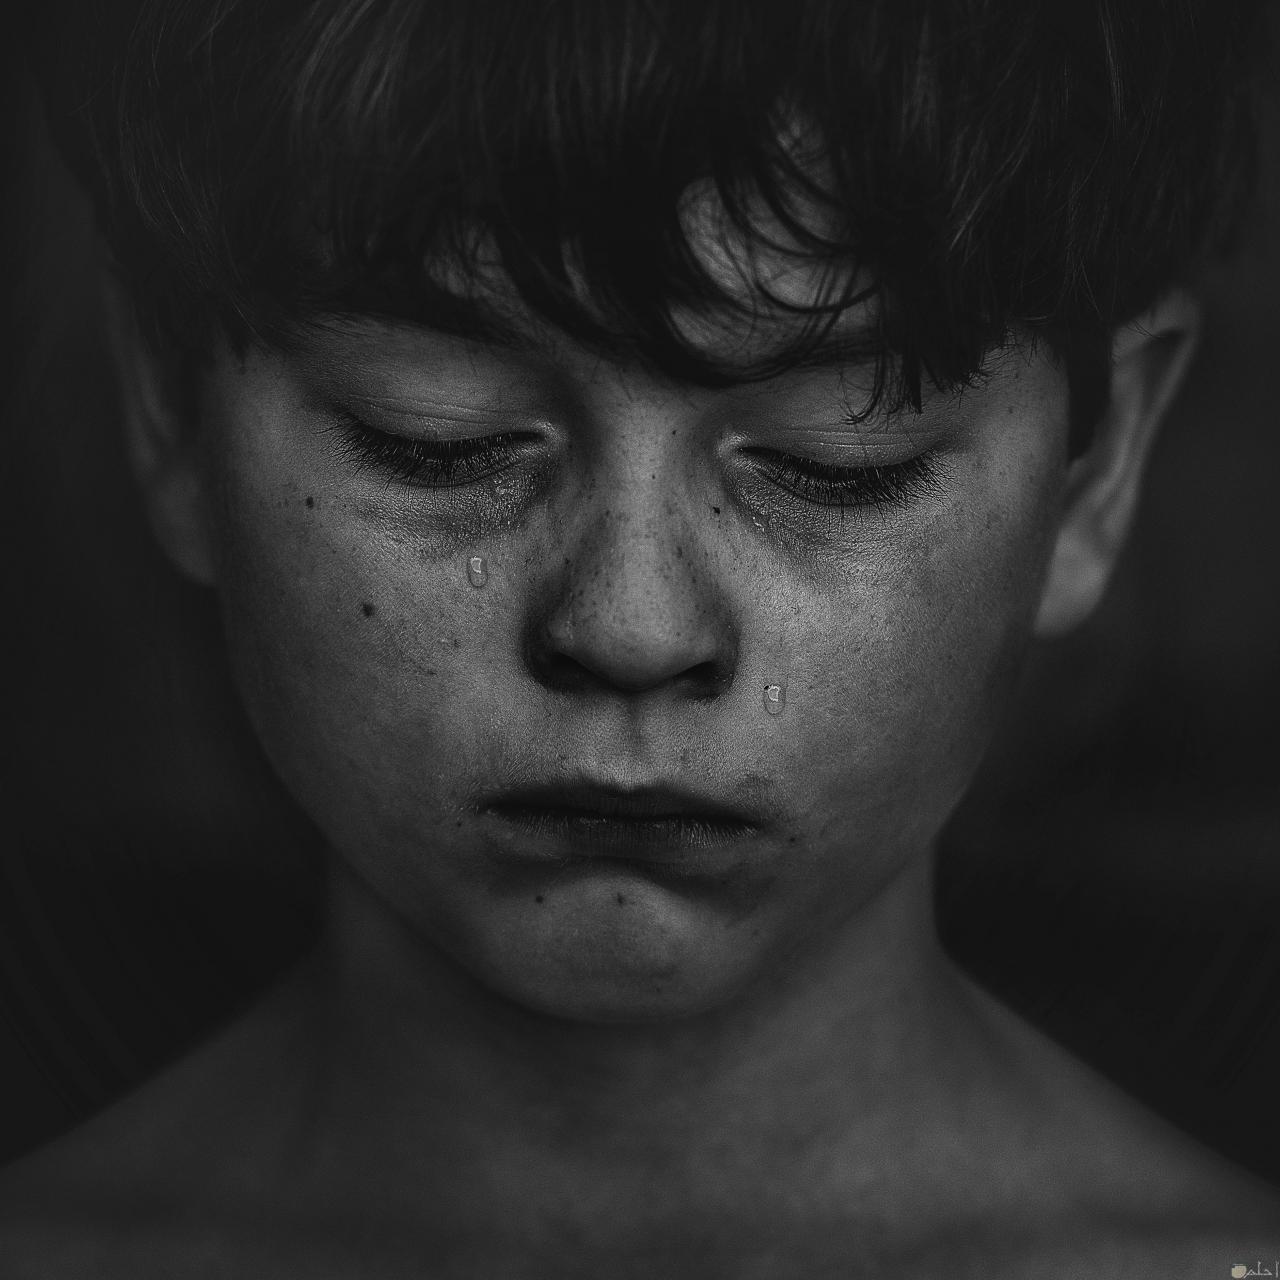 صورة صور شباب زعلان , زعل وحزن وقهر